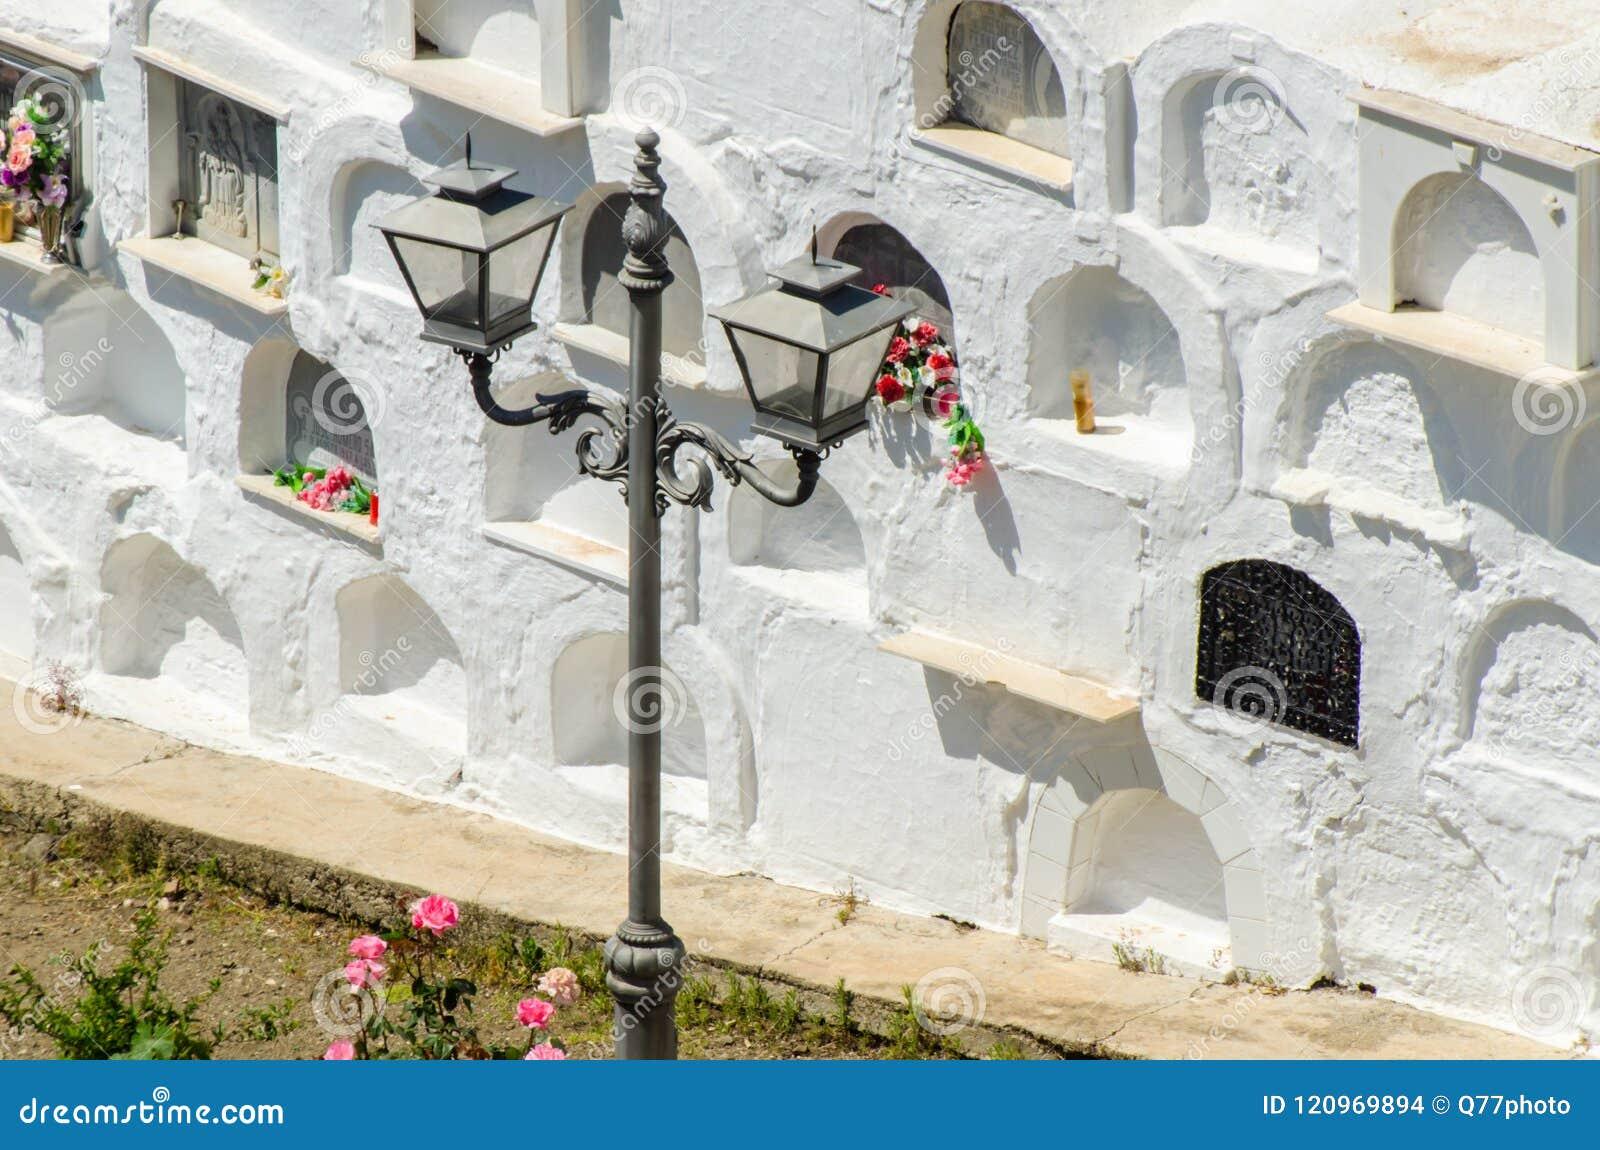 SAYALONGA, ΙΣΠΑΝΙΑ - 6 Μαΐου 2018 χαρακτηριστικό ισπανικό νεκροταφείο στο ρ